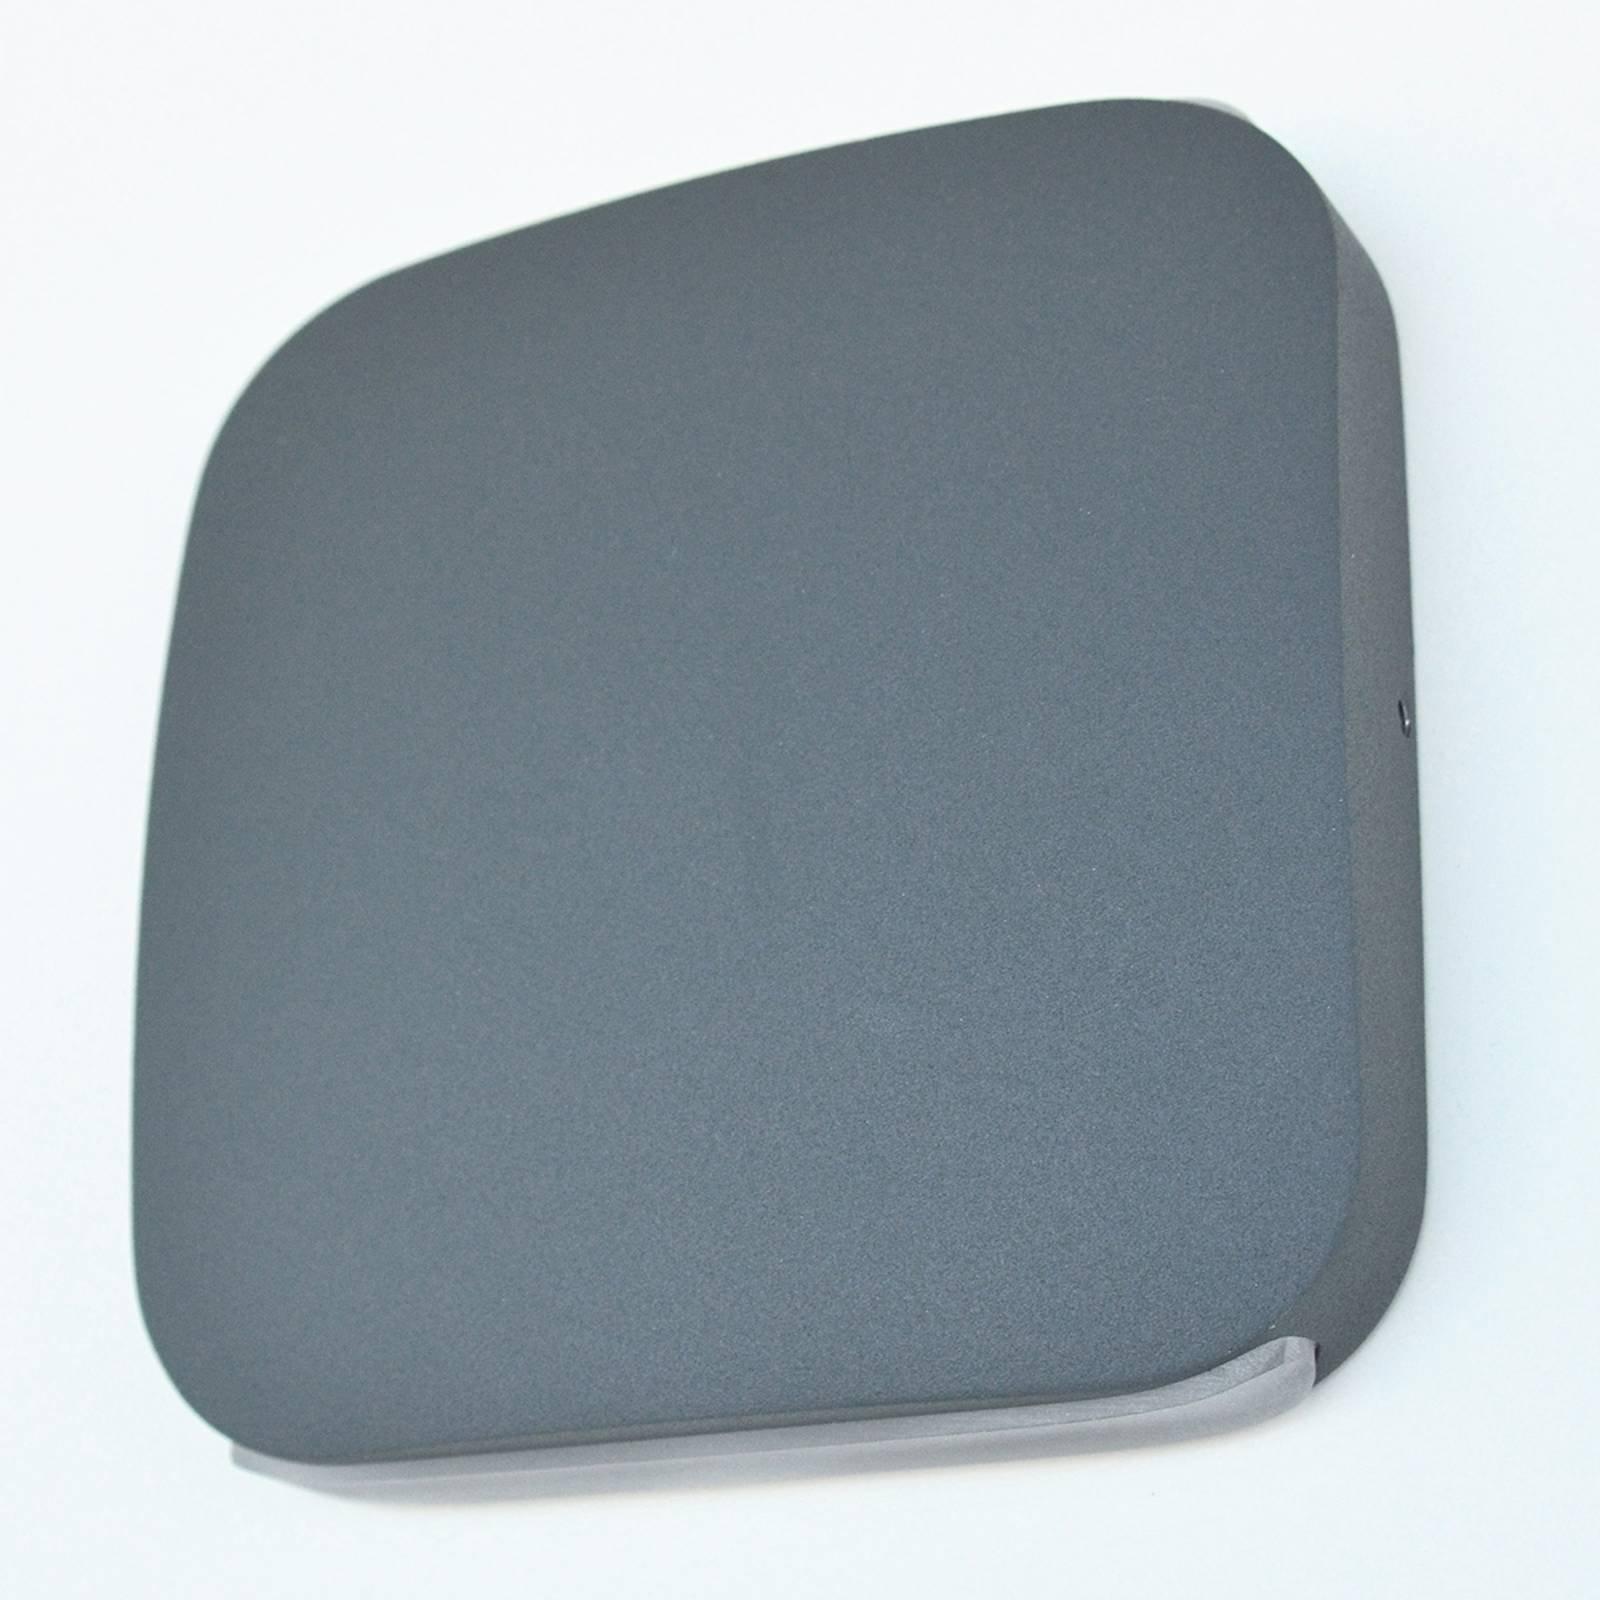 Utendørs LED-vegglampe Astuccio, mørkegrå